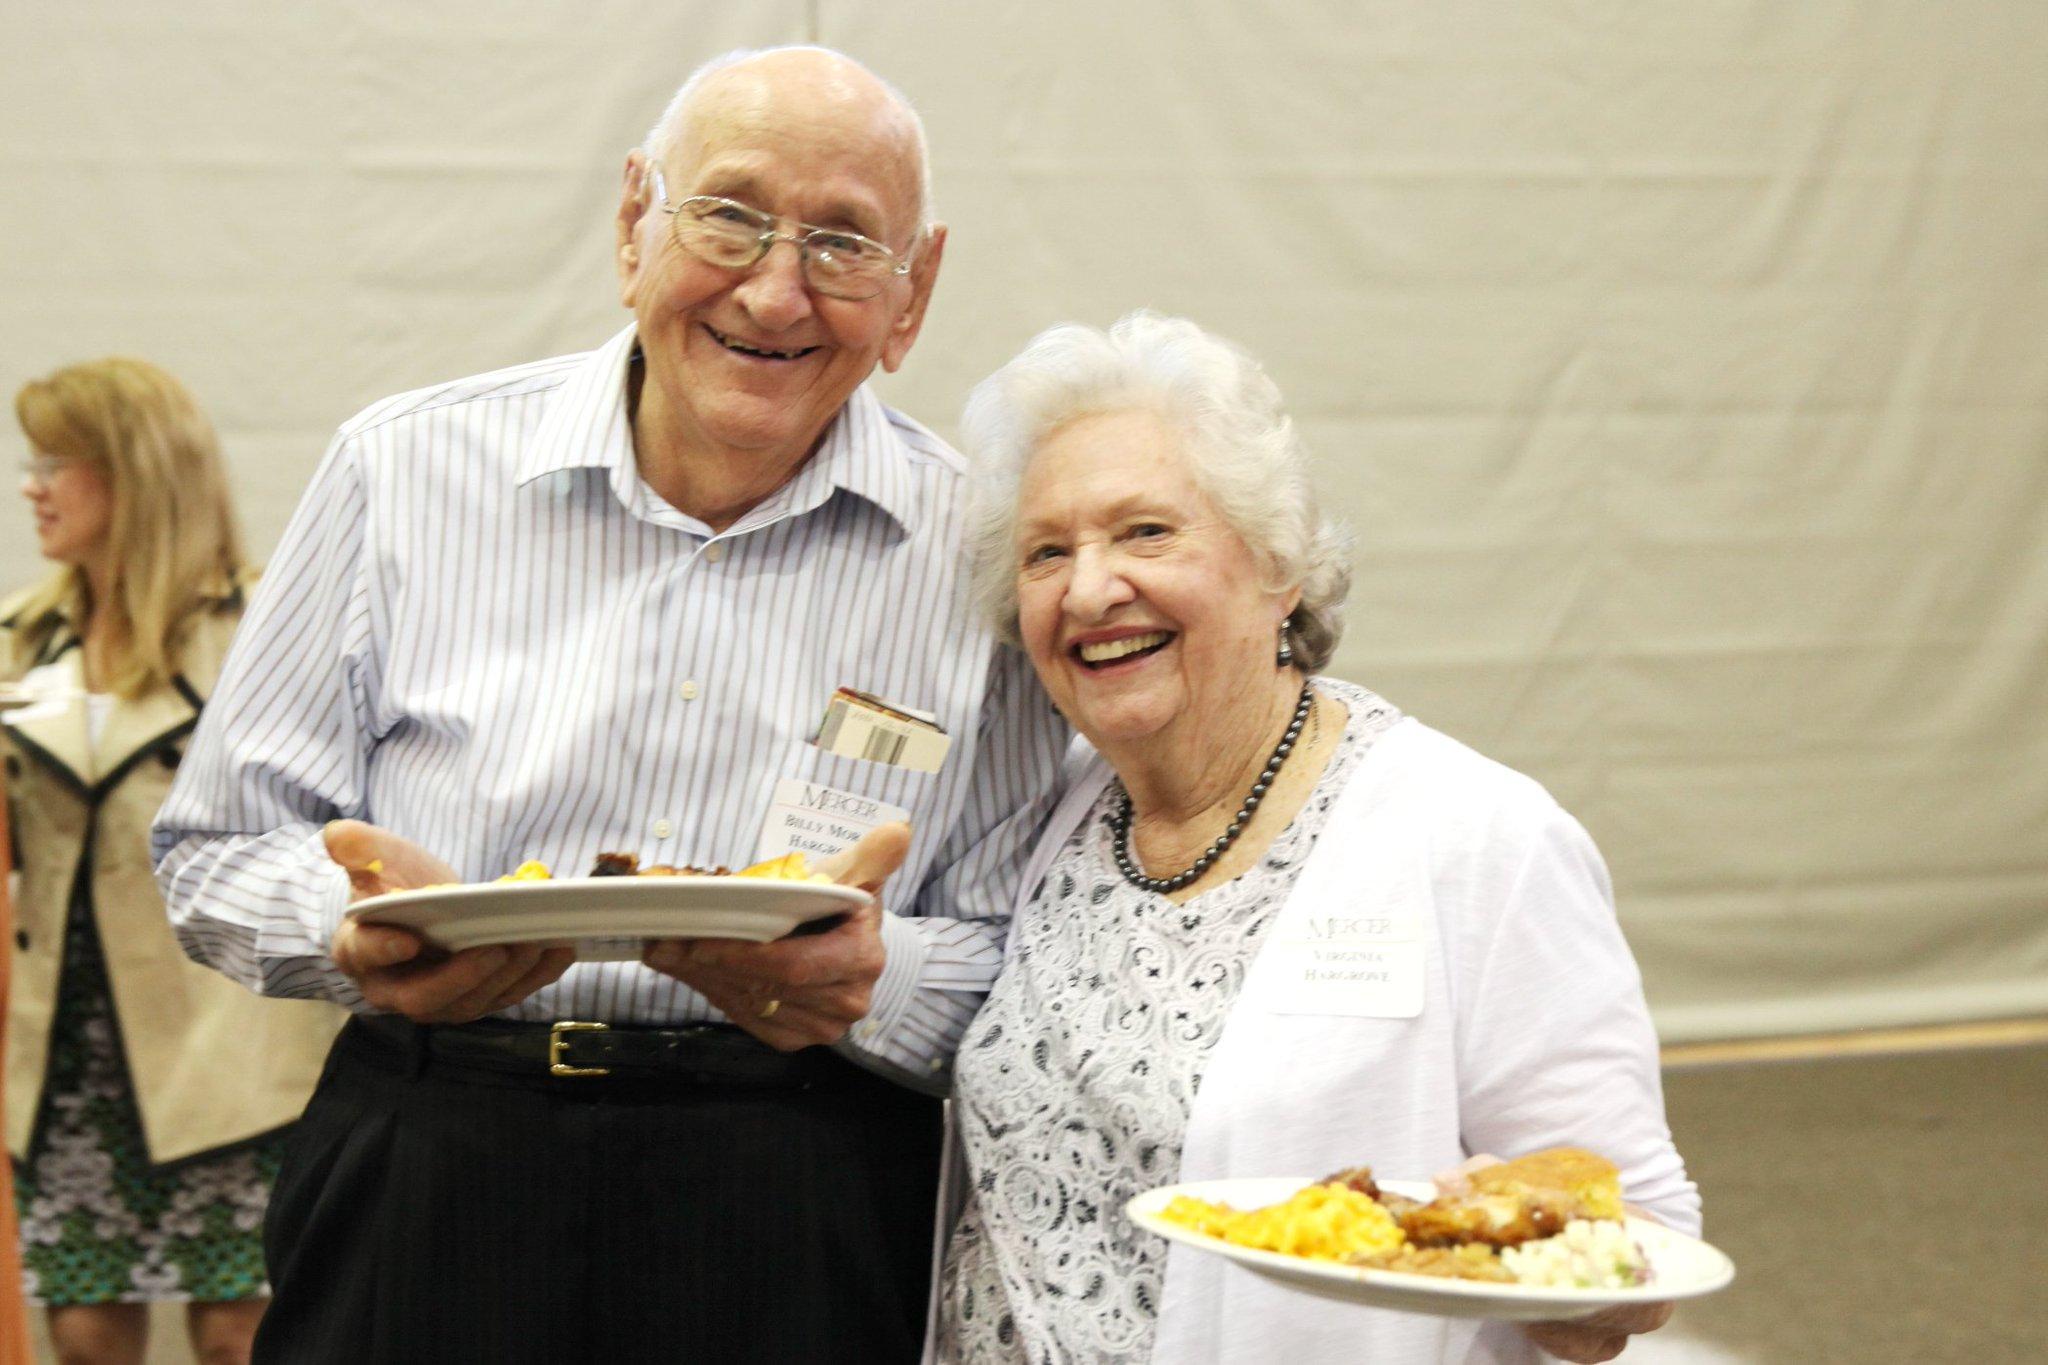 PHOTOS: Half Century Club Lunch #MercerHC16 https://t.co/x3SdED6WQB https://t.co/LNq6WGSWfq